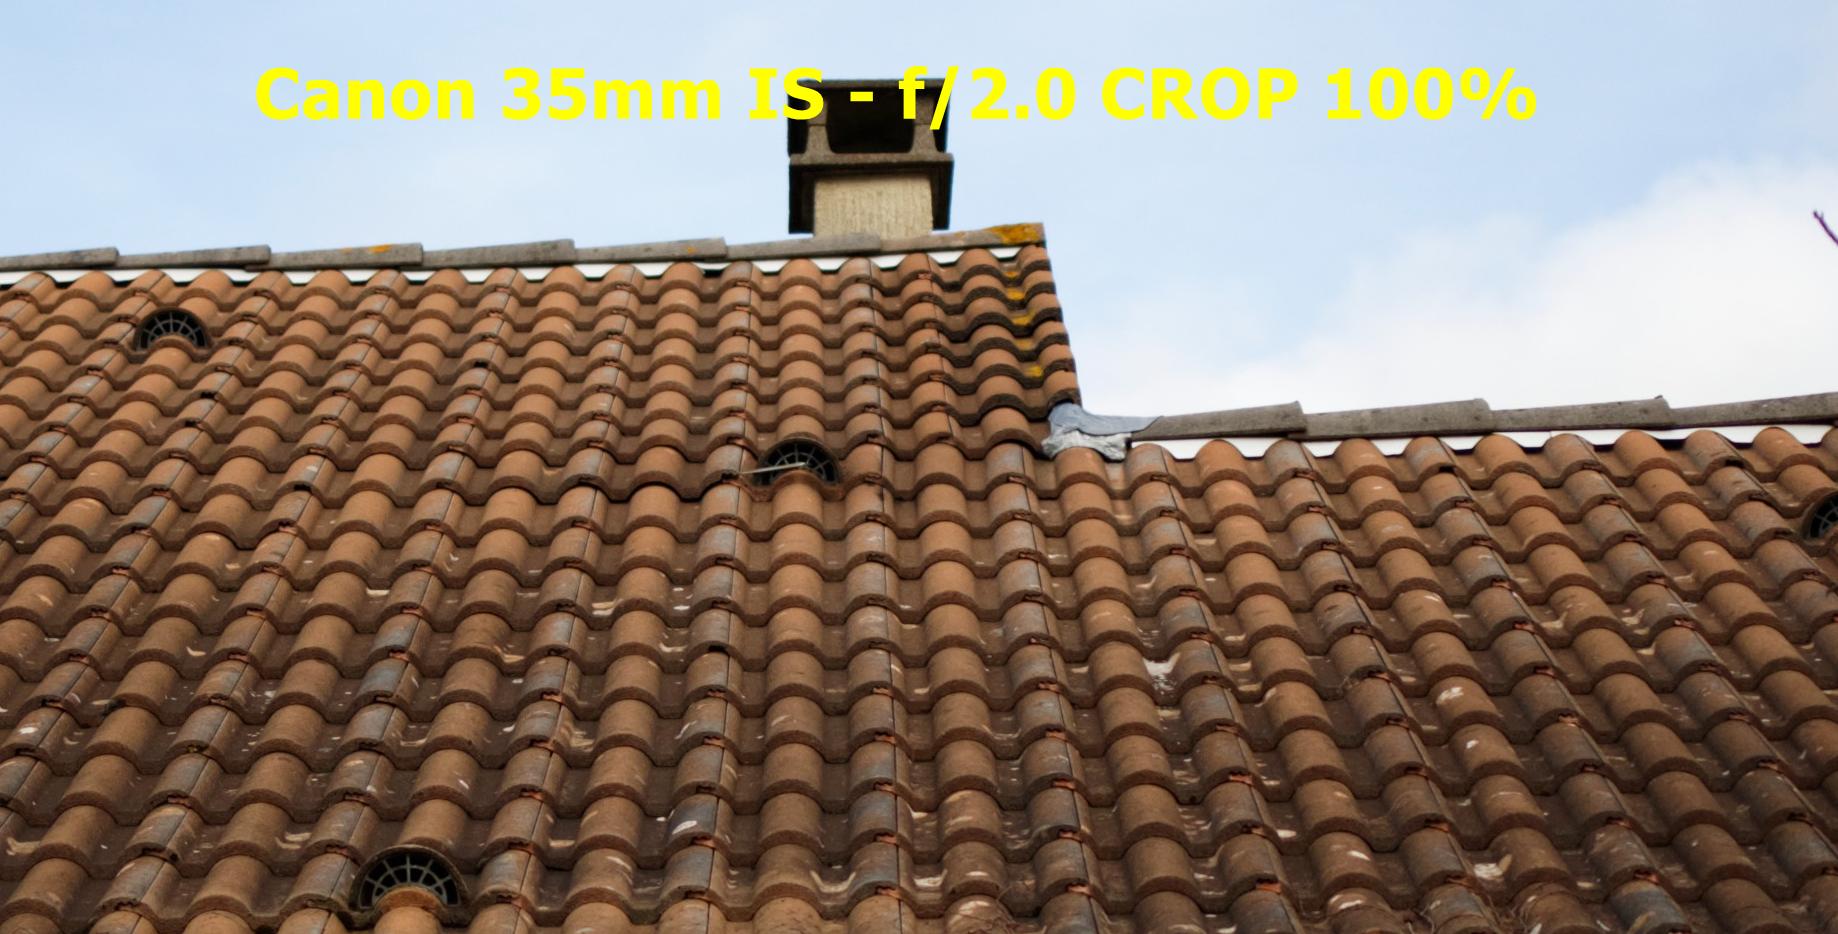 Test piqué d'image Canon EF 35mm f/2.0 IS USM sur Canon Eos 5DIII - Beanico-photo.fr